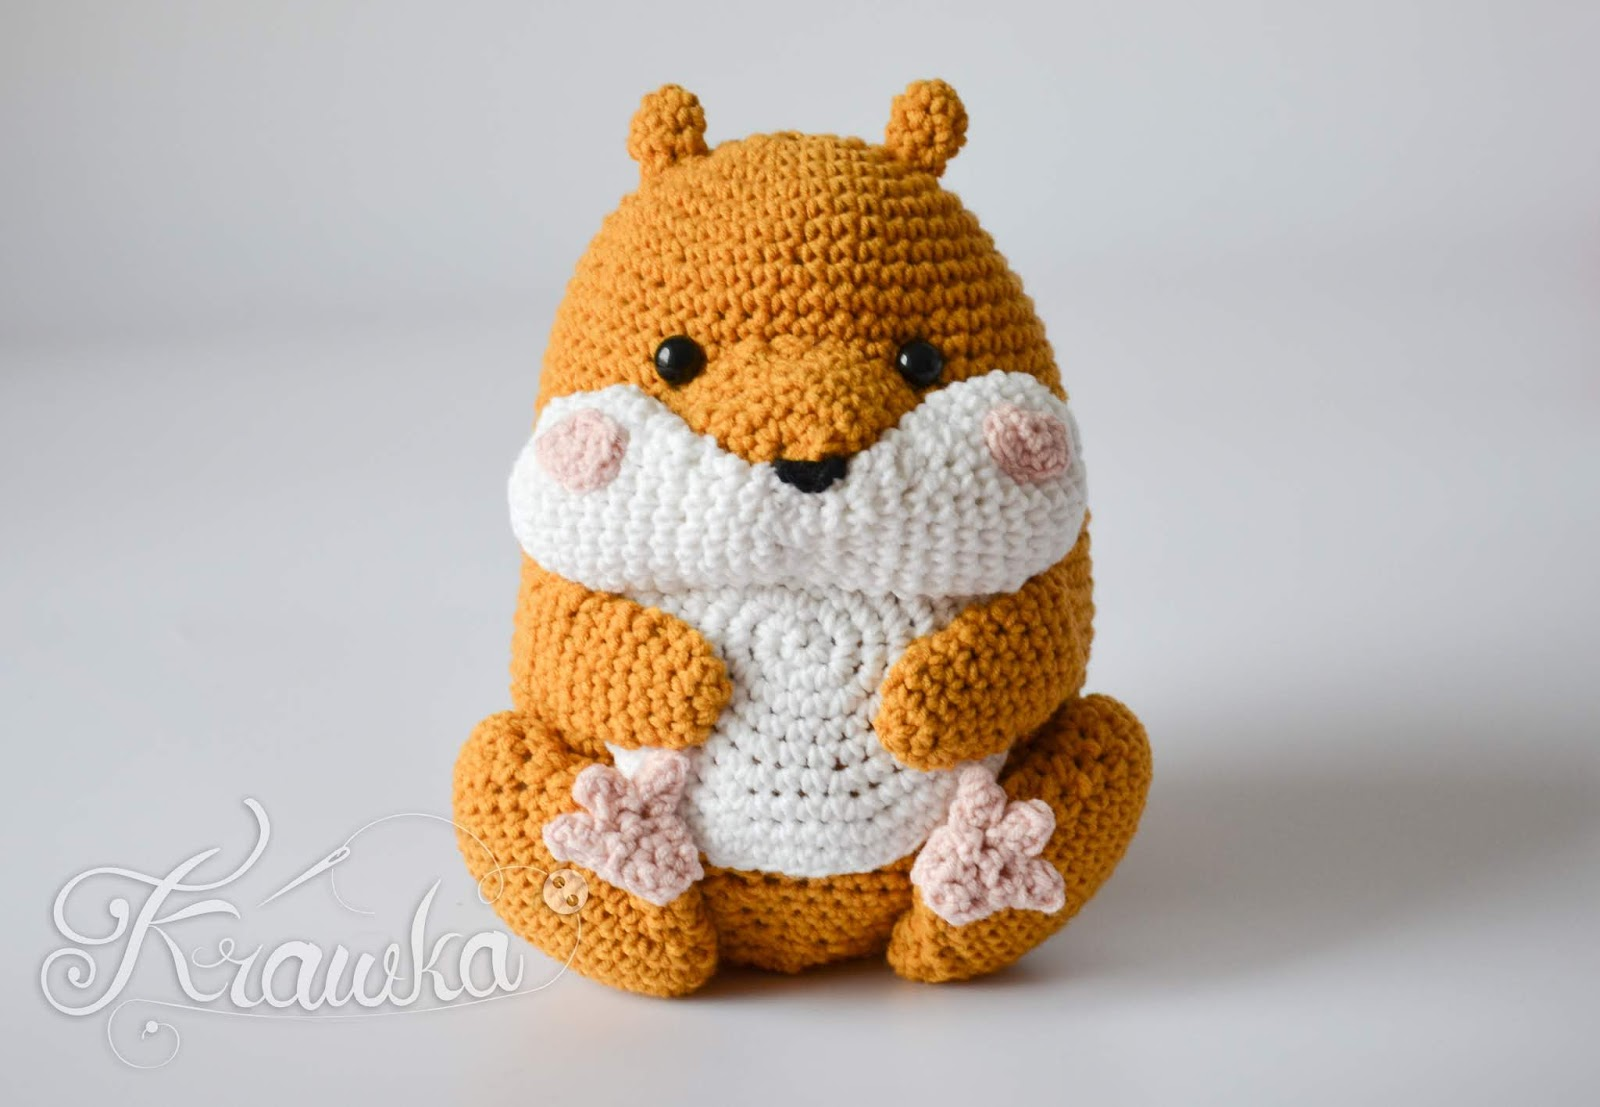 147c7b78c34e Krawka  Cute Hamster pet animal crochet pattern by Krawka